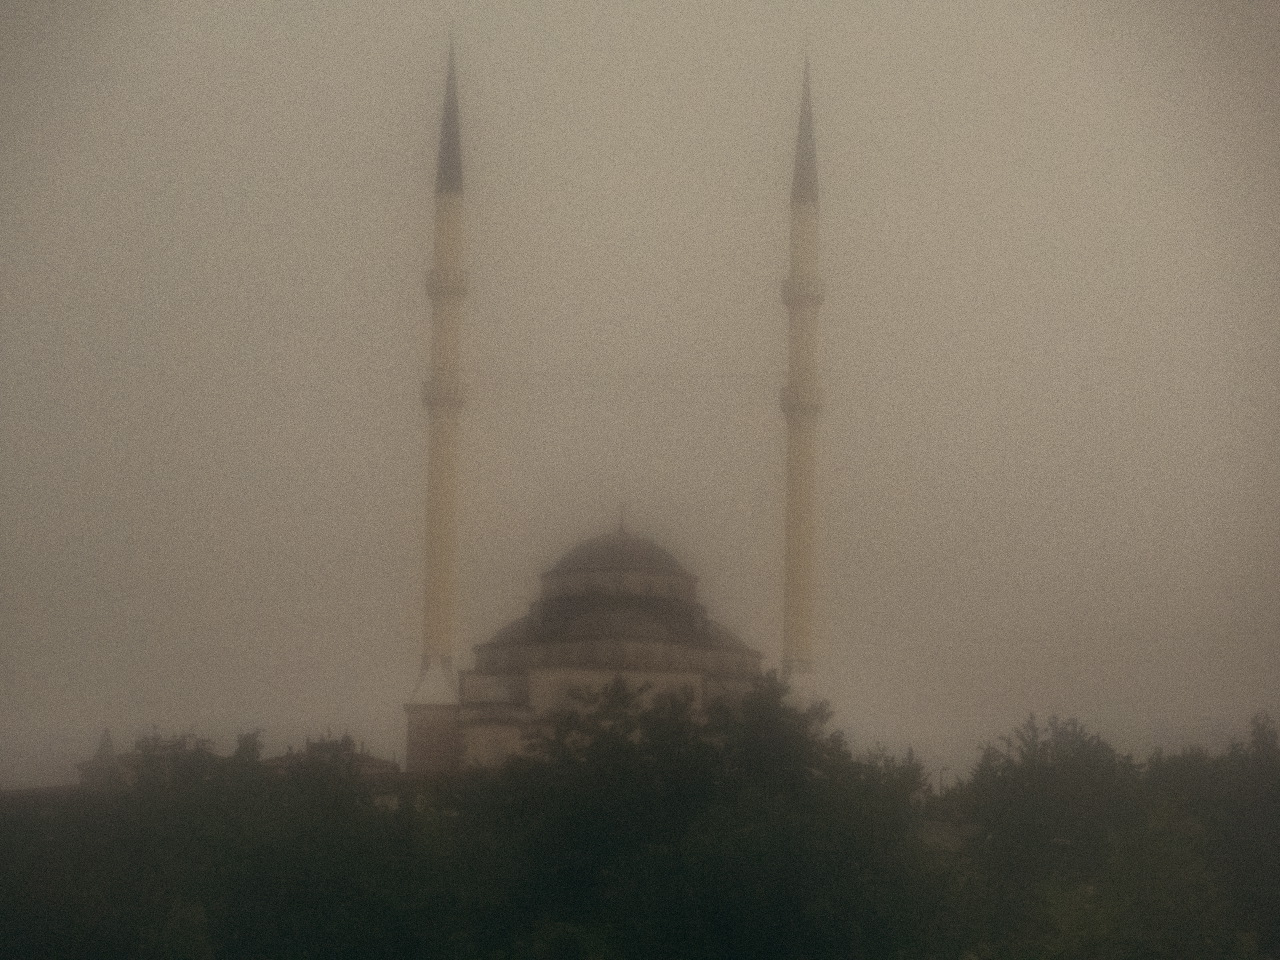 istanbul_buzz_web_size_005.JPG